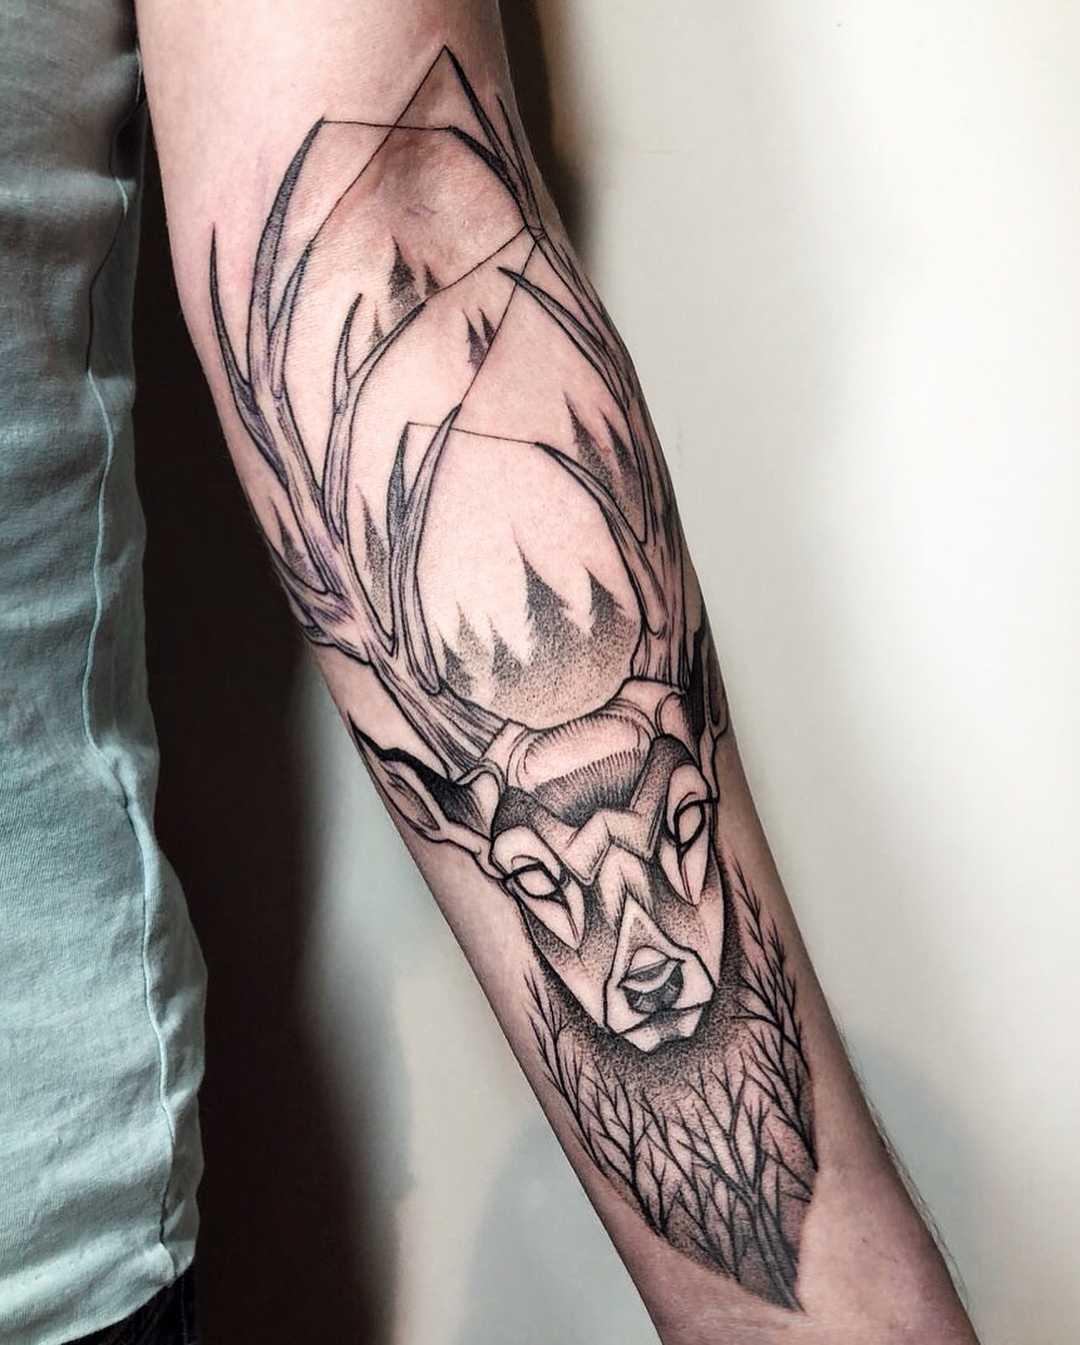 Deer tattoo on the forearm by Sasha Tattooing